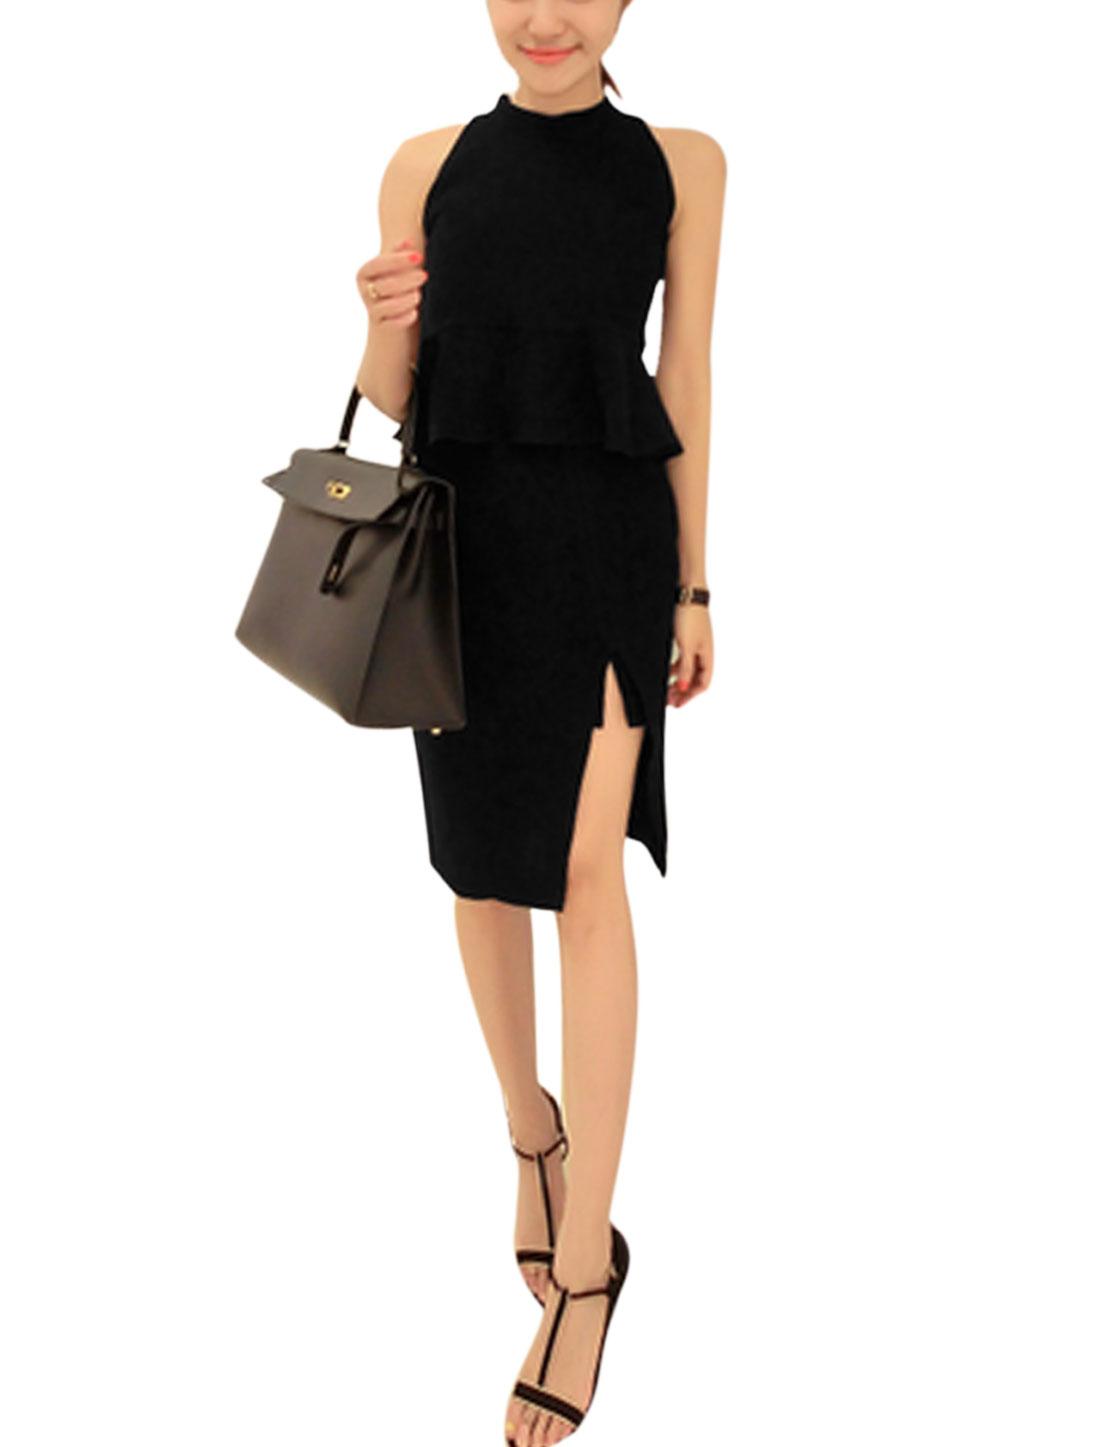 Women Sleeveless Peplum Top w Mid Rise Split Side Casual Skirt Set Black M